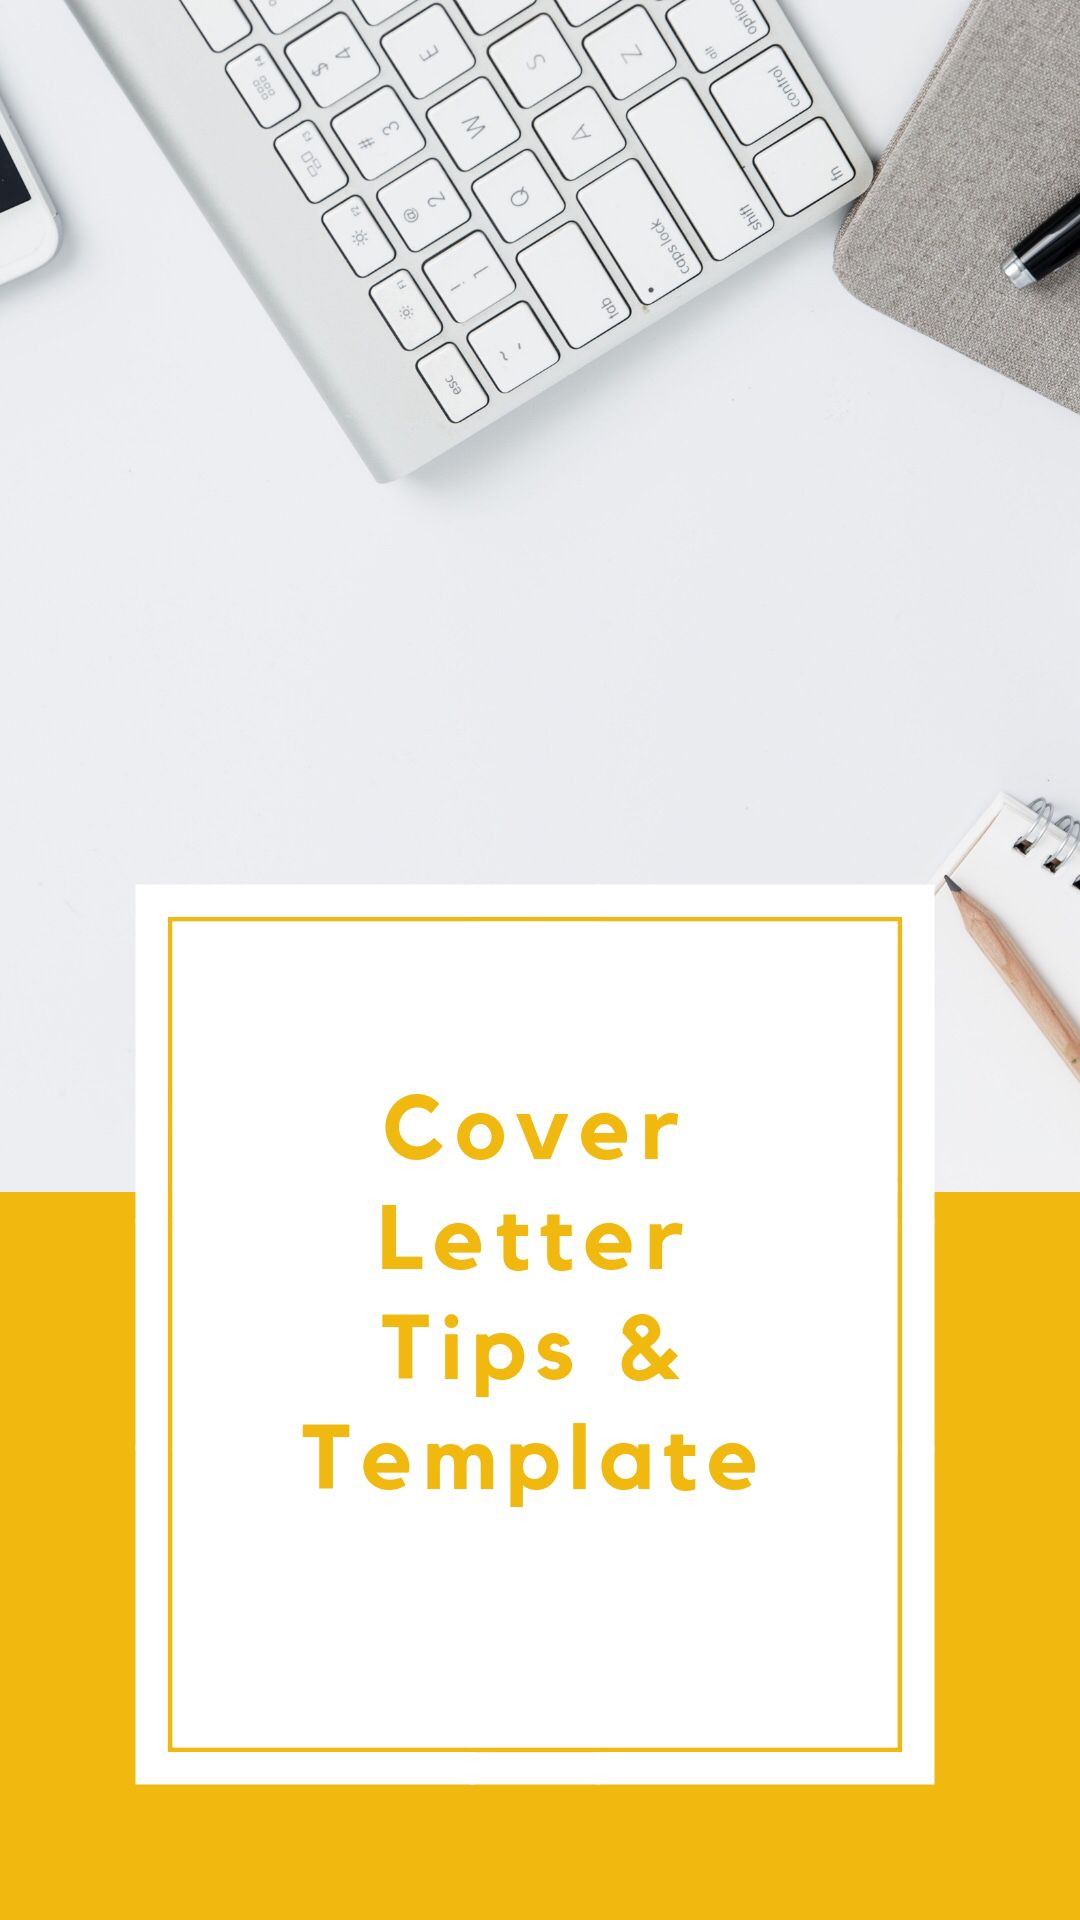 Cover letter tips template cover letter tips